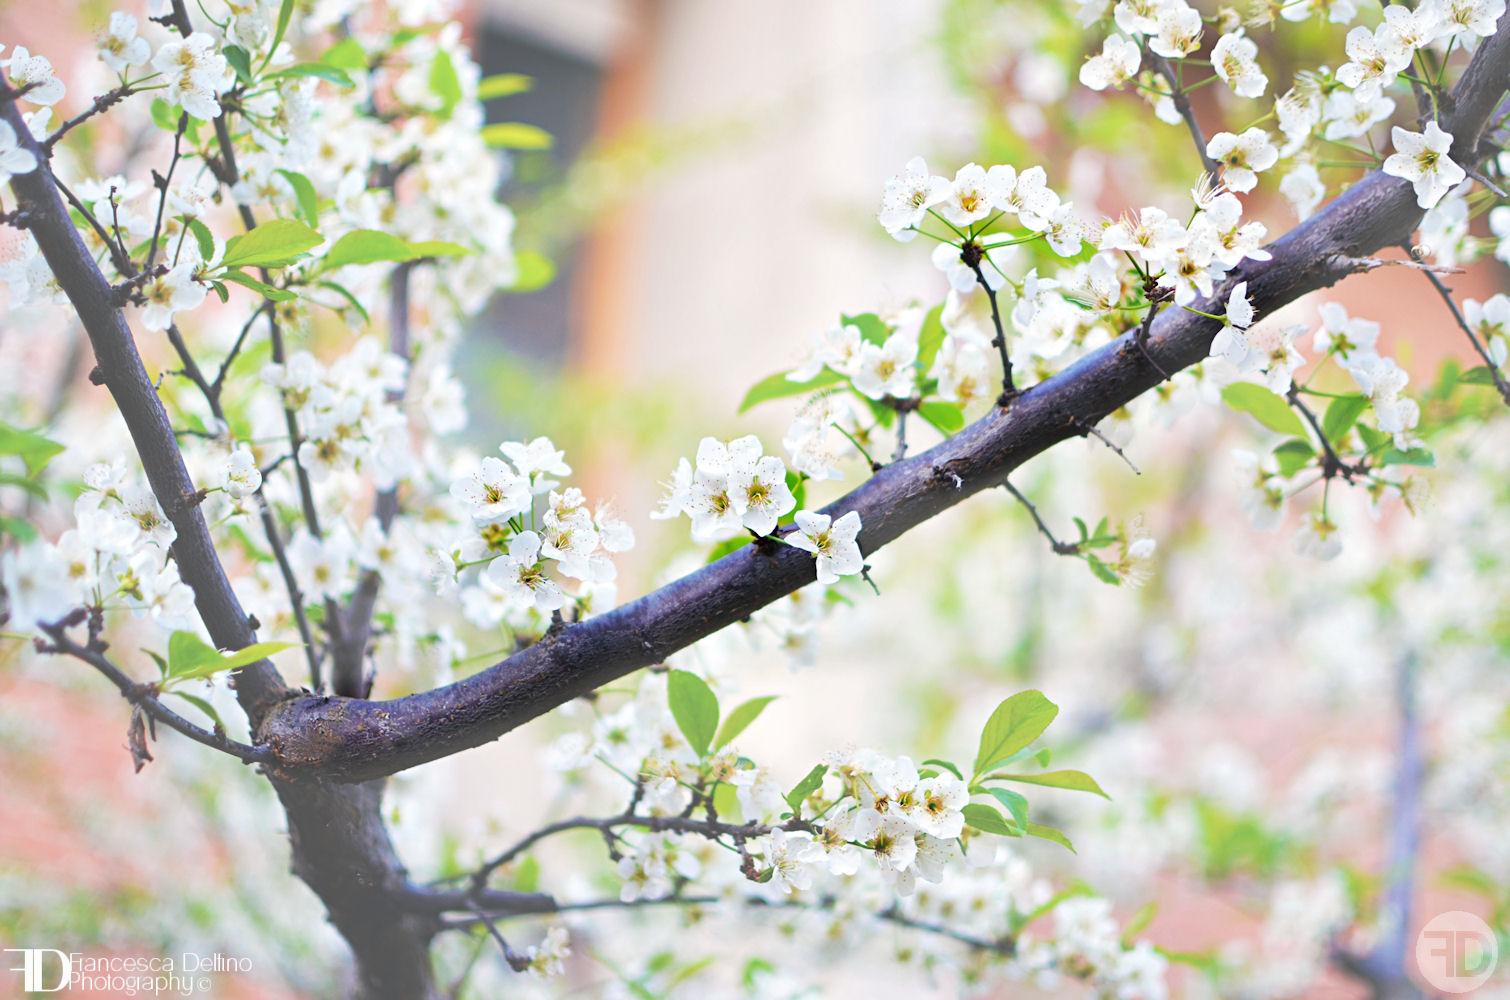 The beauty of spring 2 by FrancescaDelfino